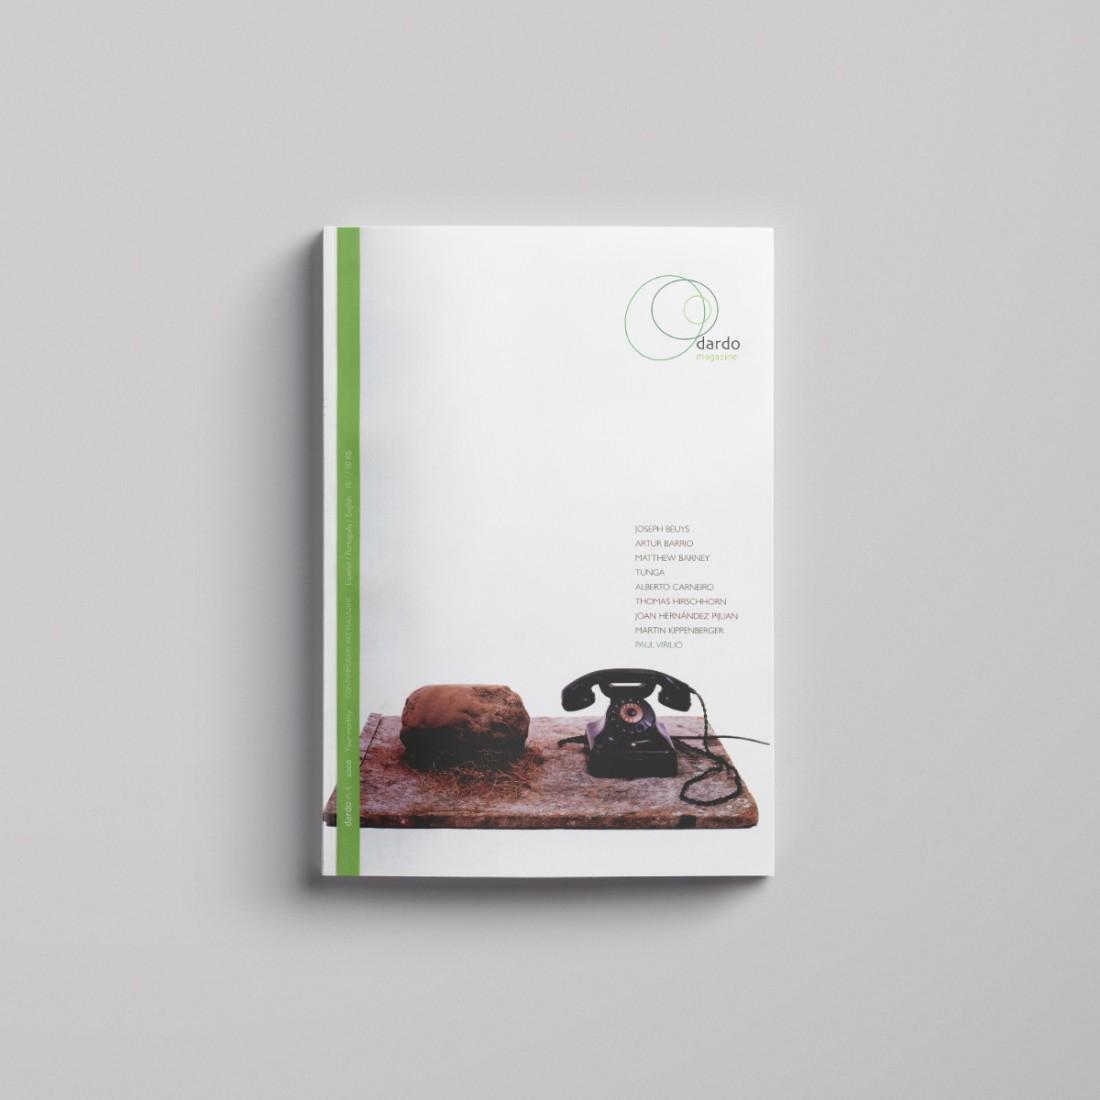 DARDOmagazine 1